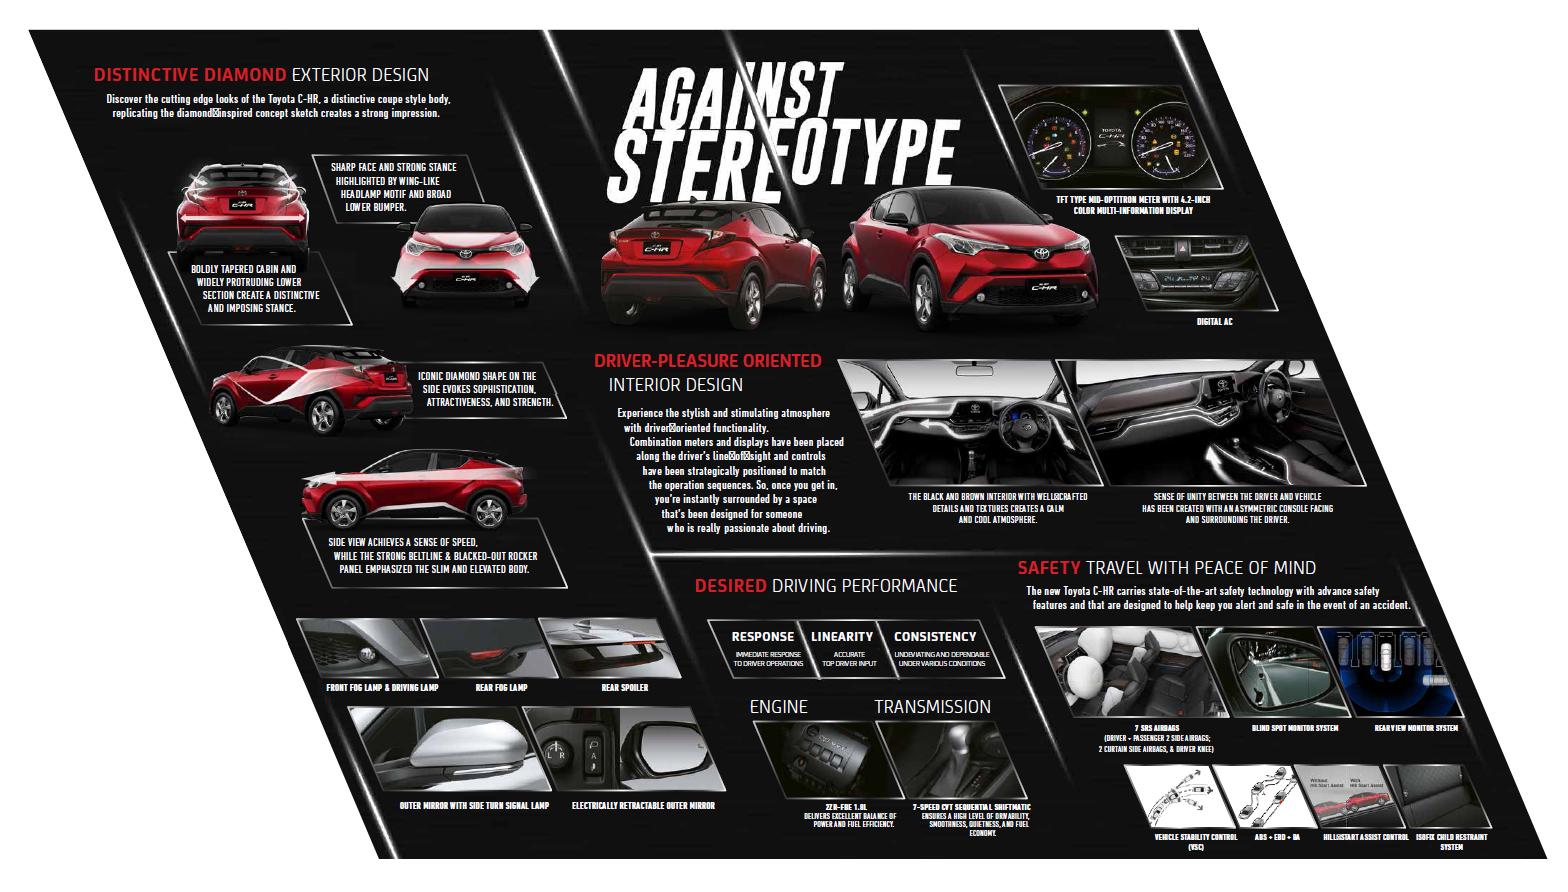 Brosur Grand New Avanza 2018 Toyota Yaris Trd 2017 All C Hr Promo Jakarta